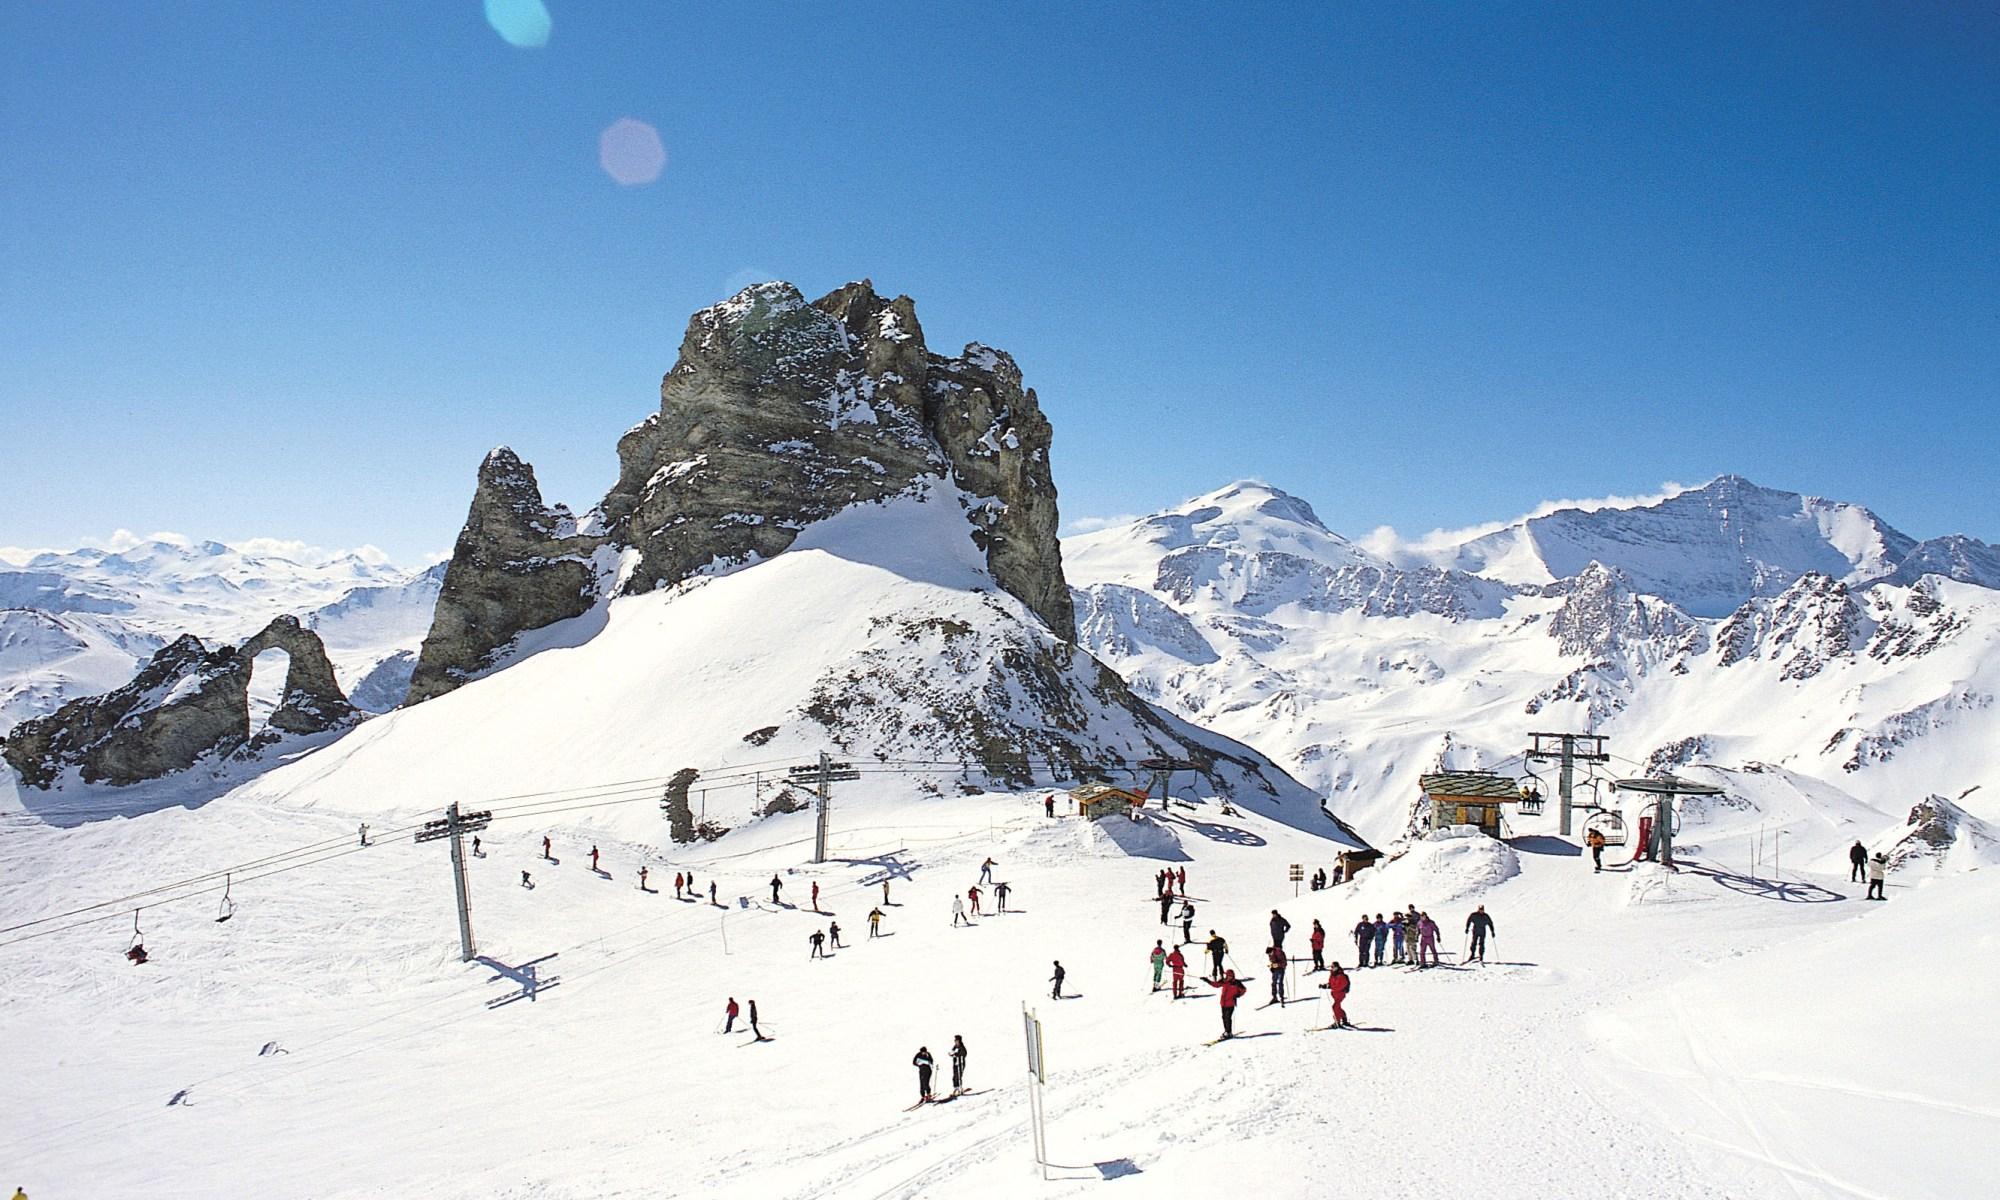 Tignes resort, where British Skier John Bromell was seen last time alive.